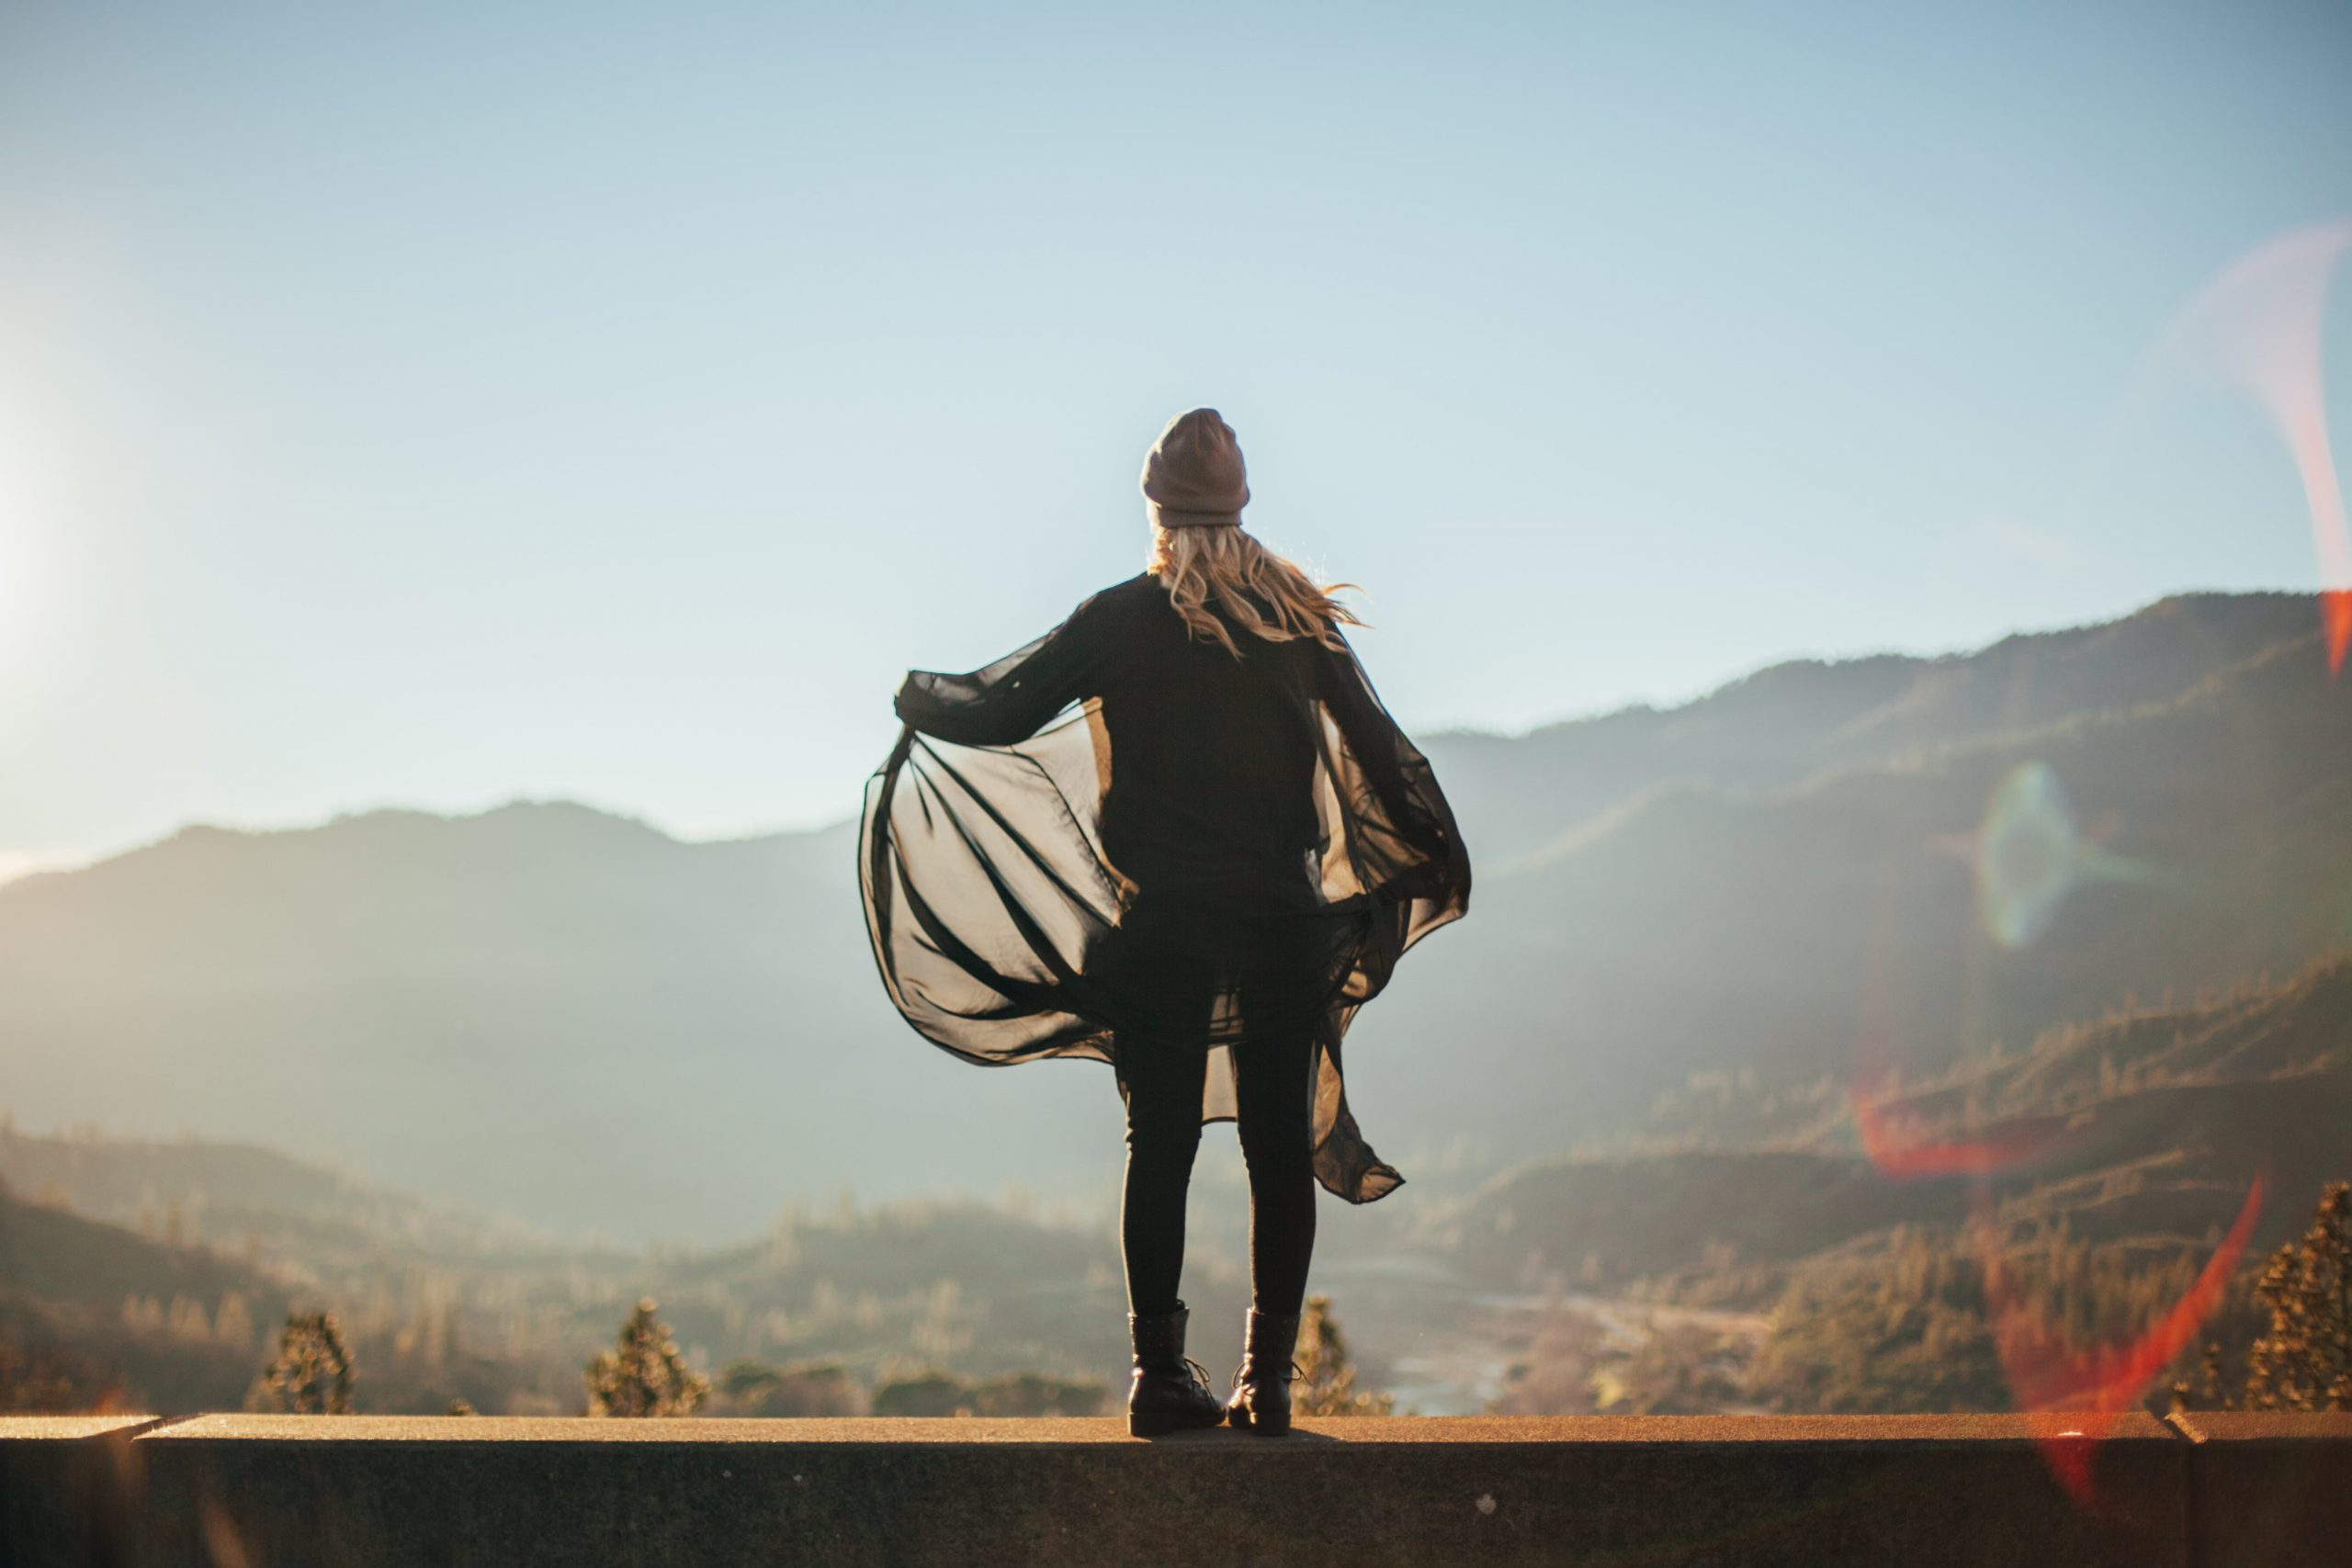 Vencer los miedos para atreverse a viajar sola 3